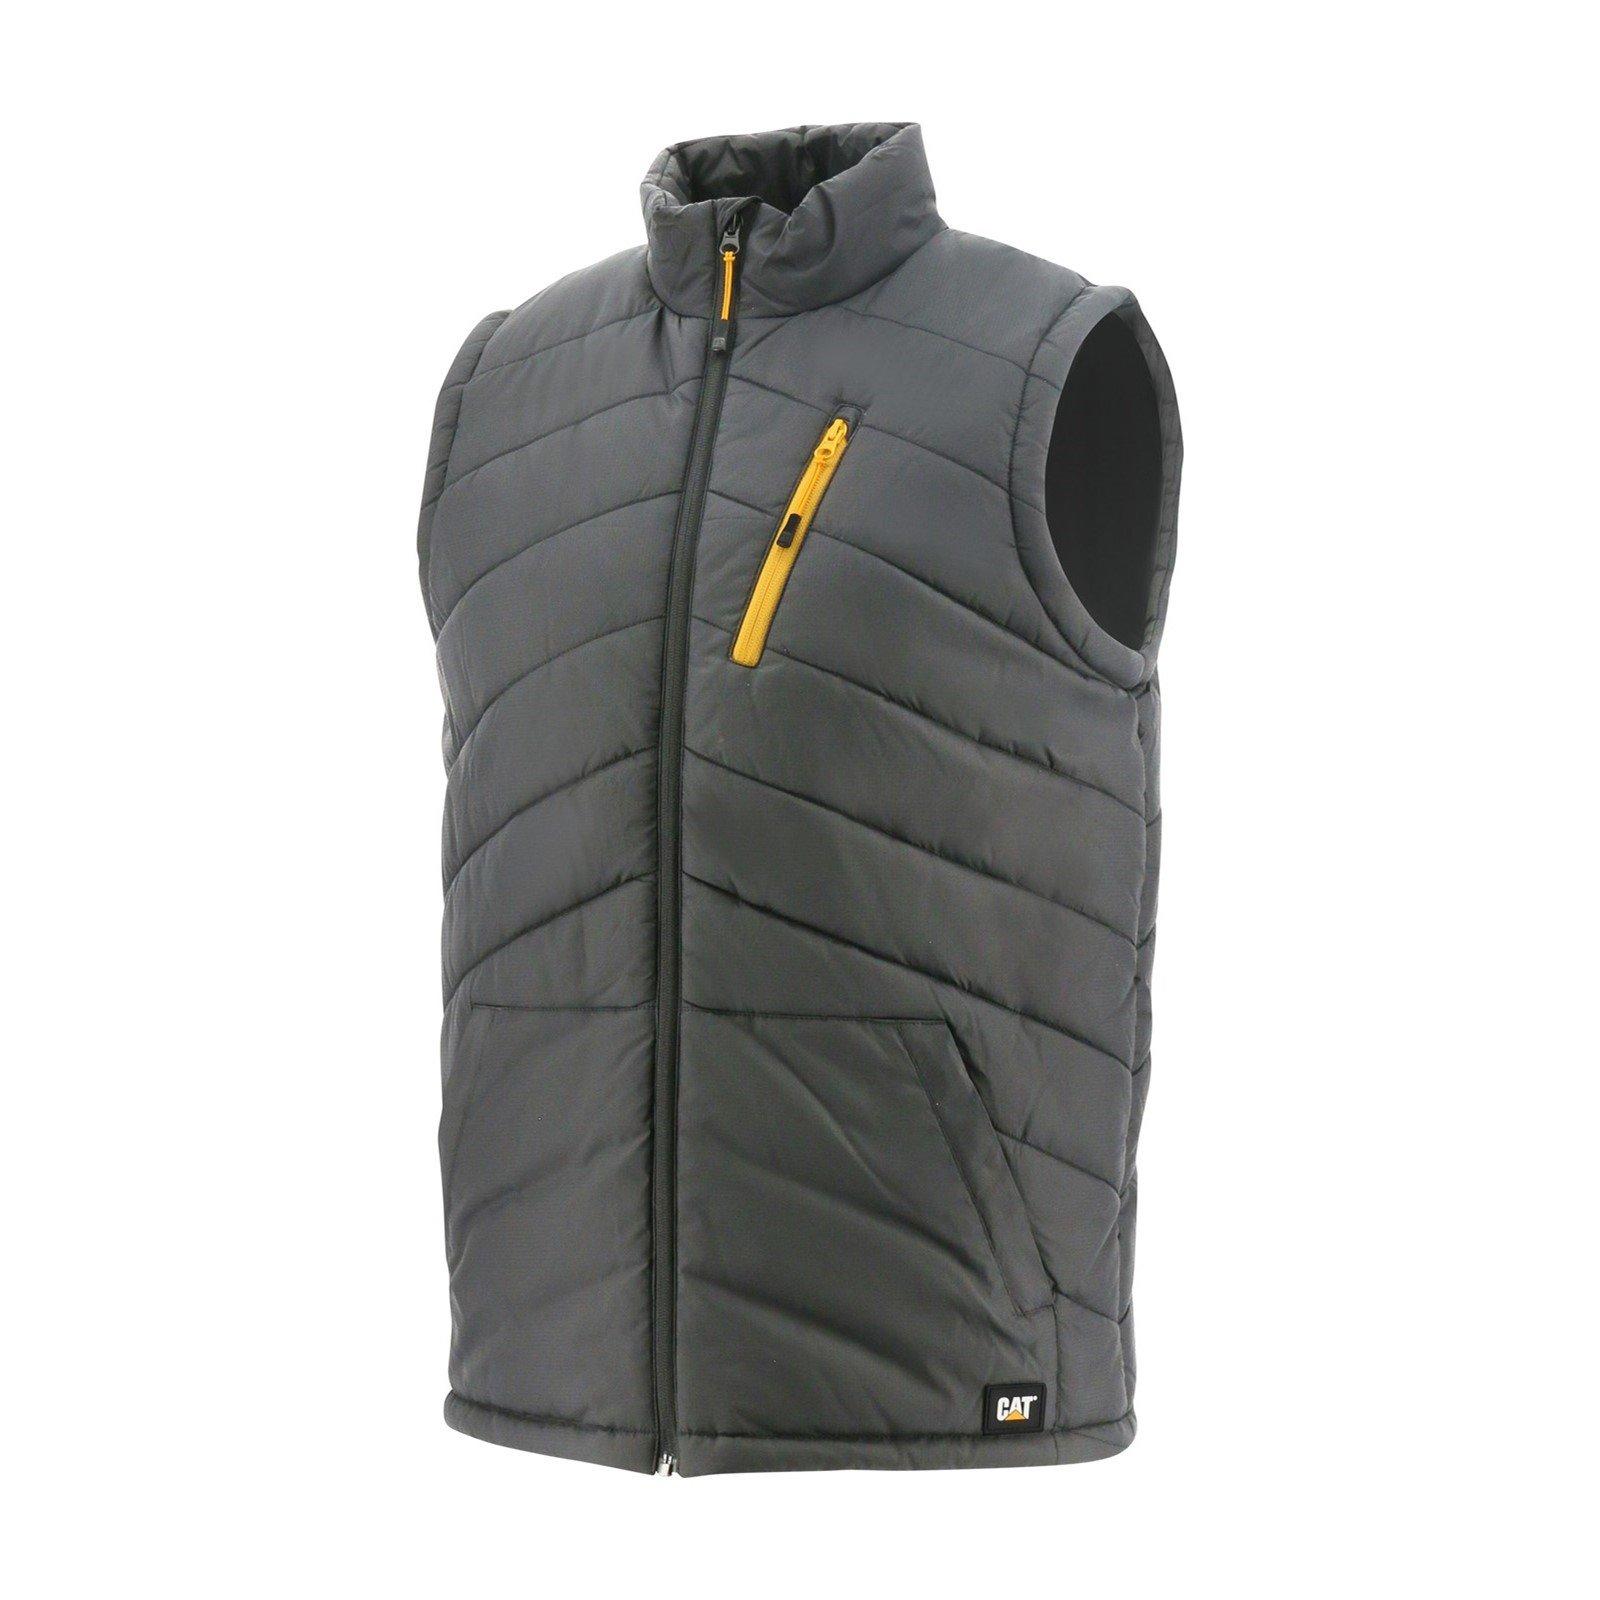 Caterpillar Unisex Essentials Jacket Various Colours 33809 - Dark Shadow Sml